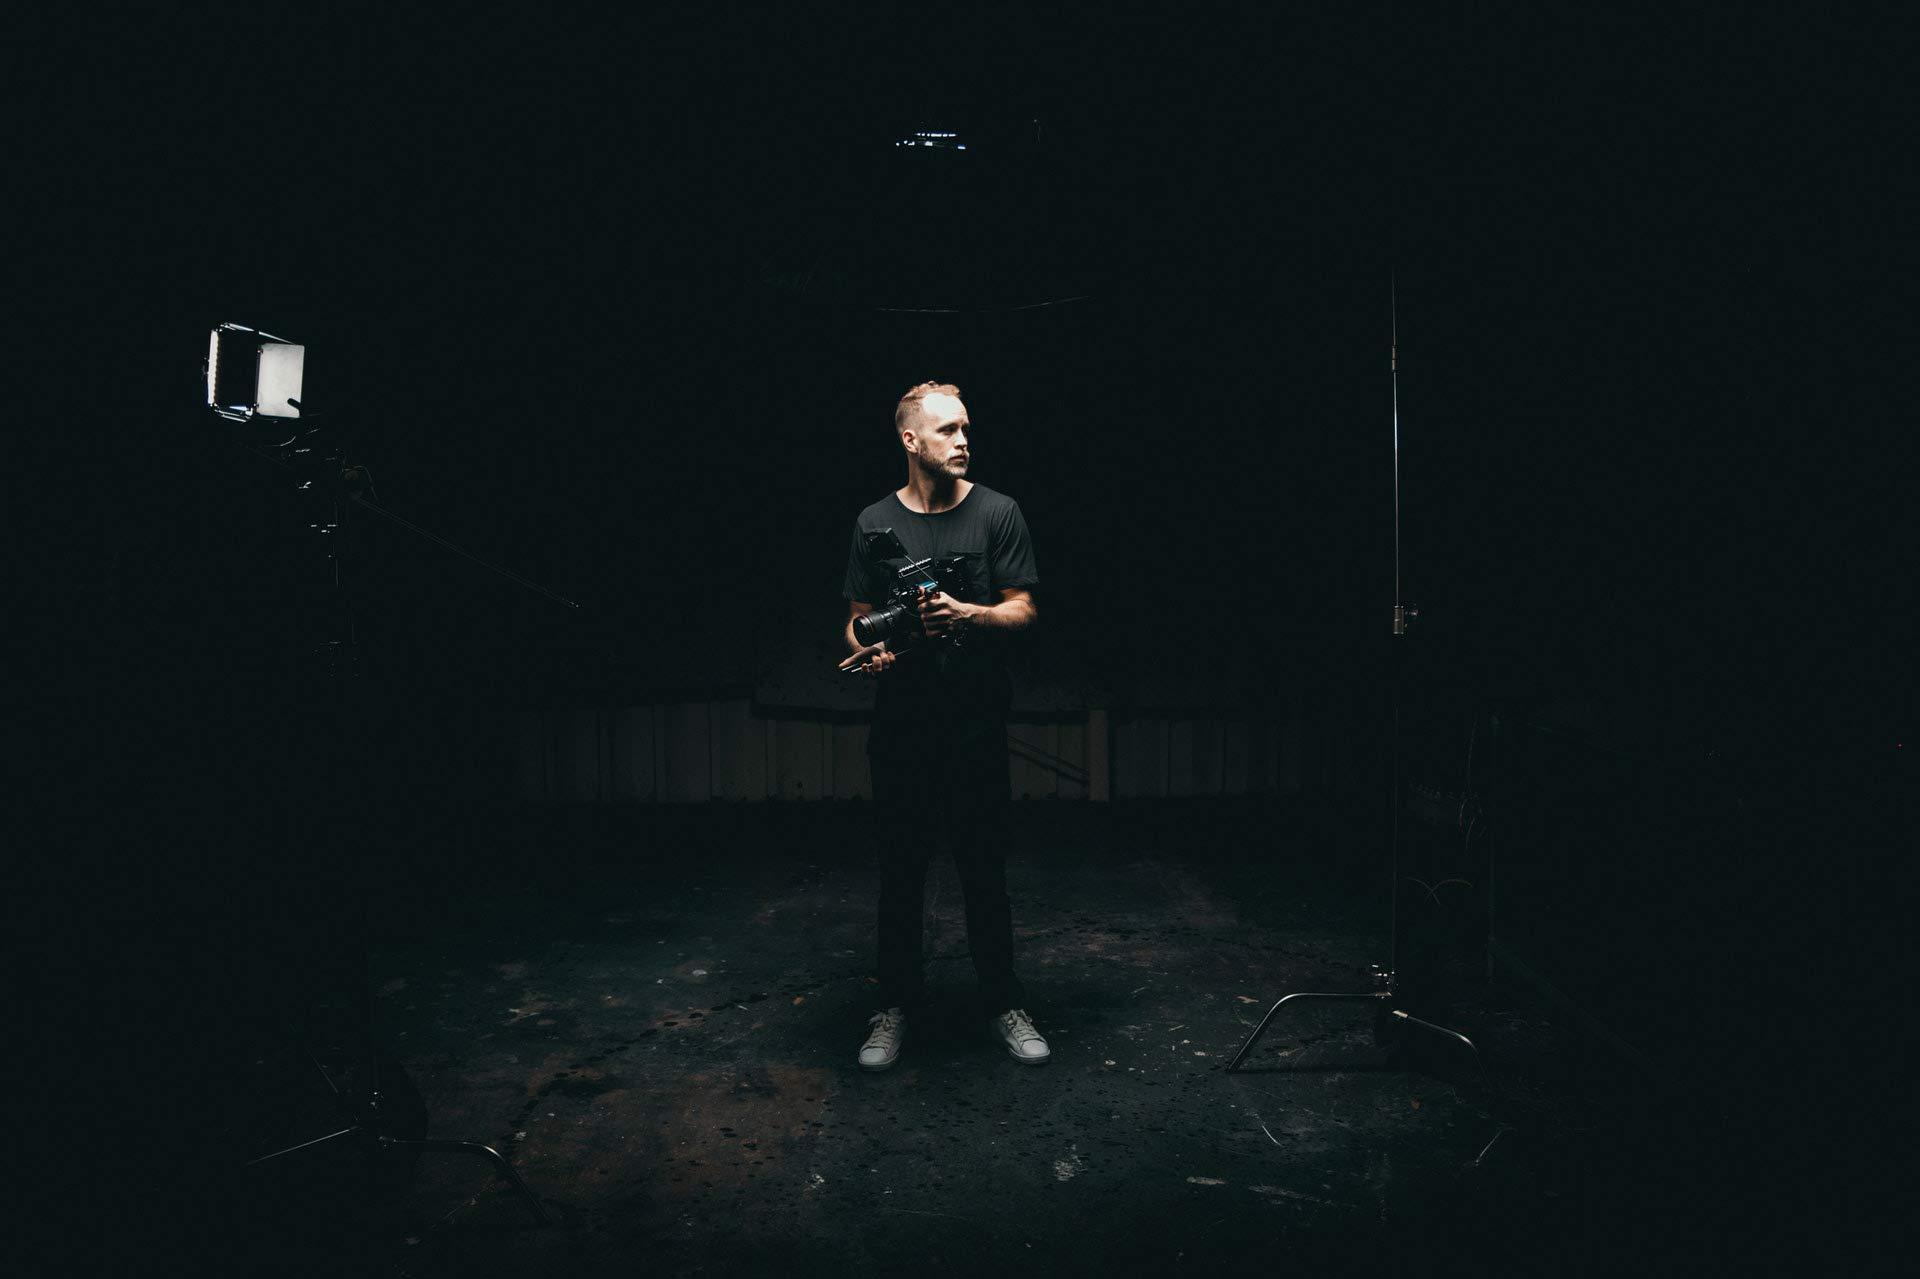 man-holding-videocamera-standing-in-studio-3379943